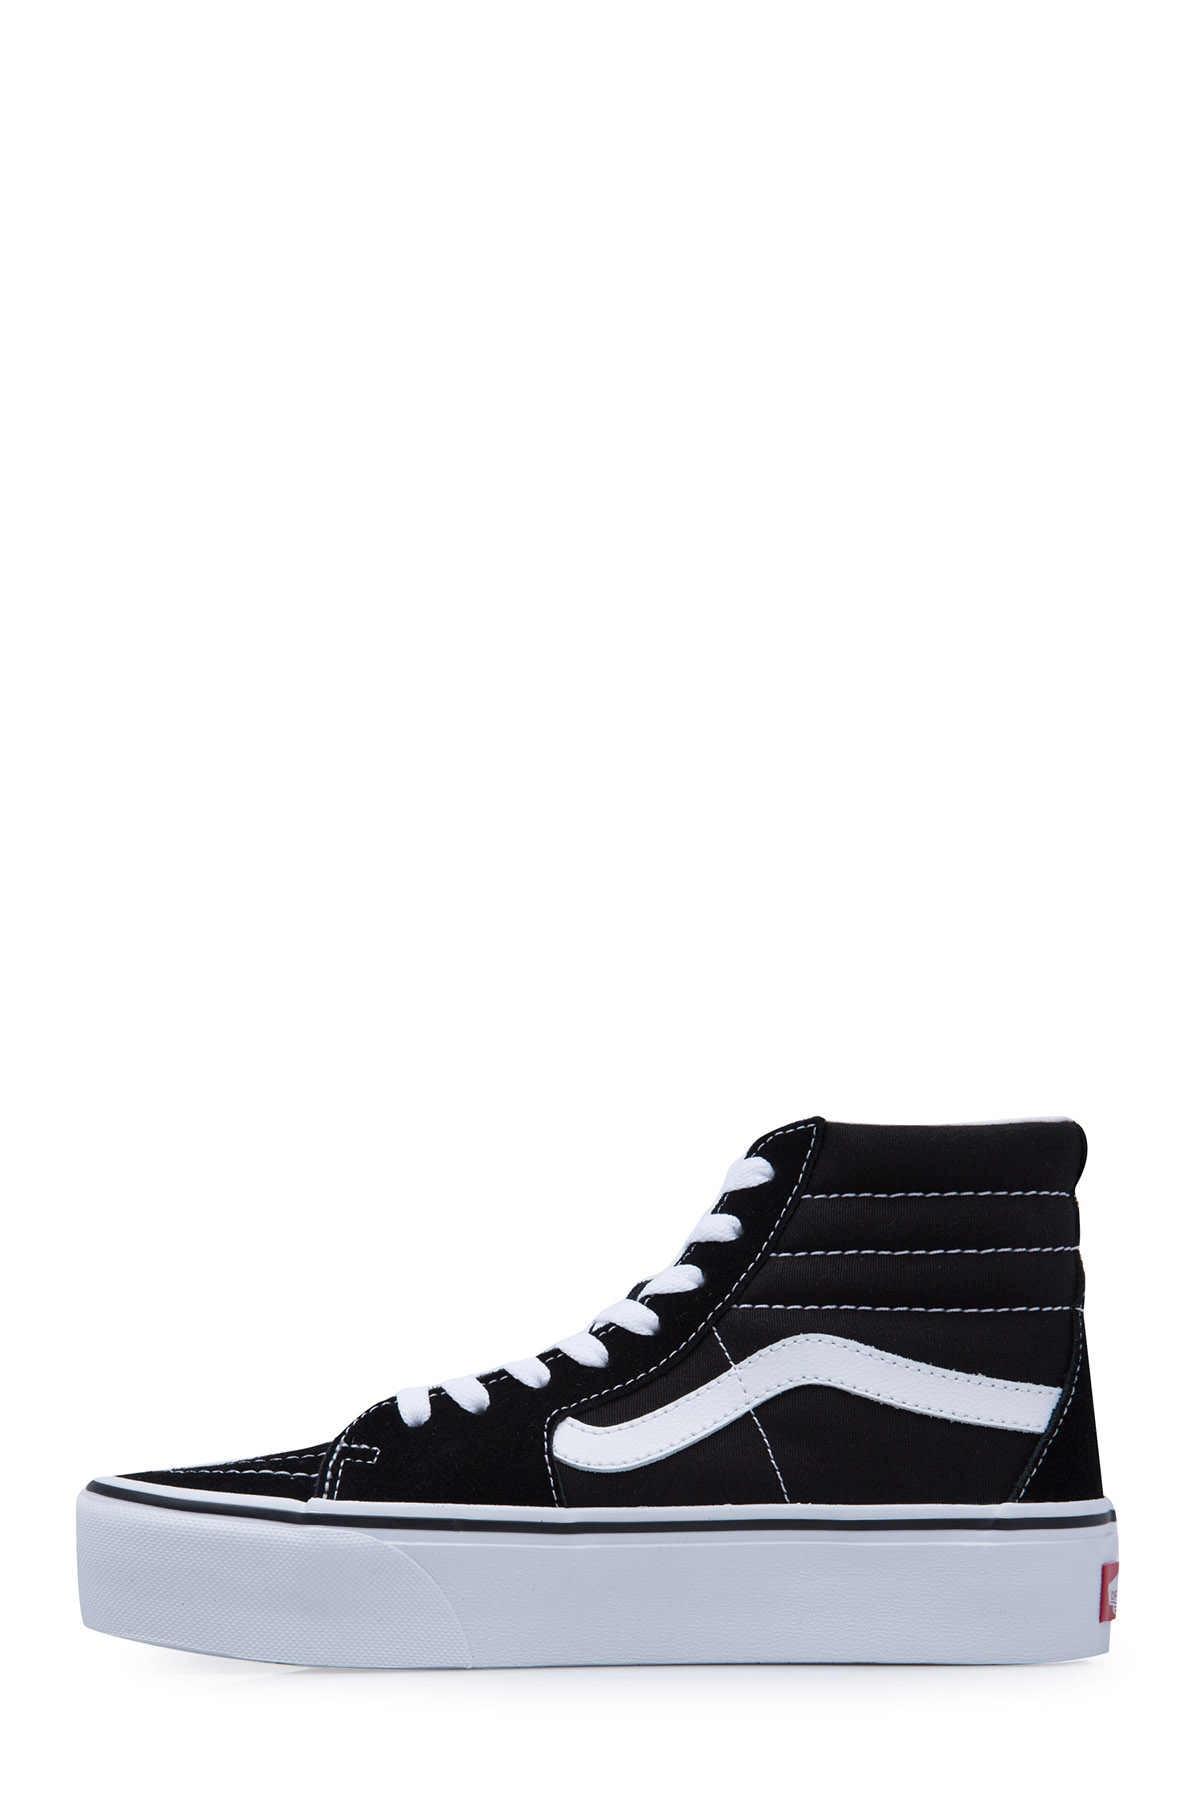 2vans calzado mujer